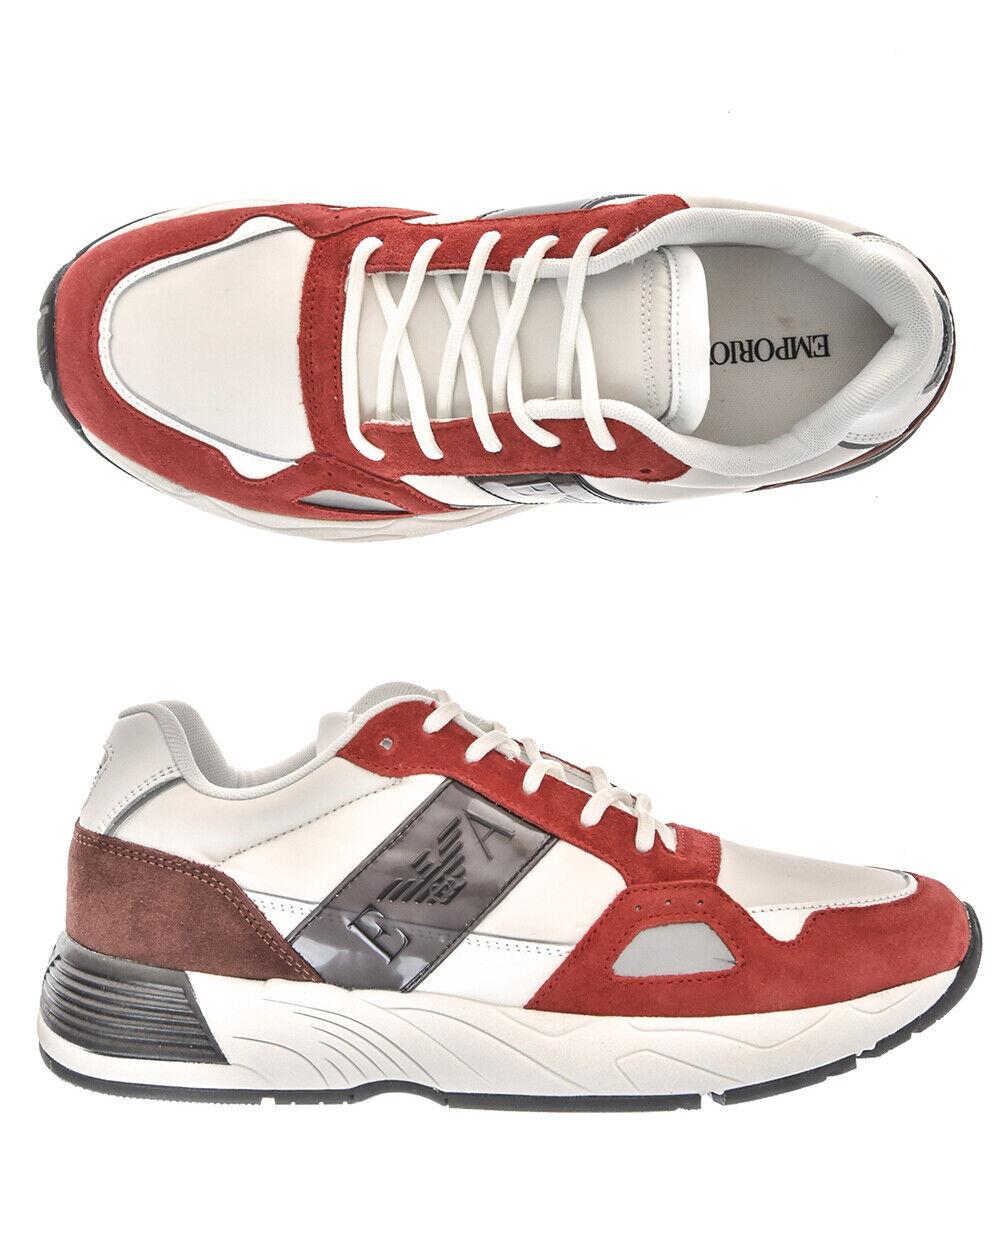 Emporio Armani scarpe scarpe da ginnastica Leather Man rosso X4X220XL187 A004 Sz.43 MAKE OFFER